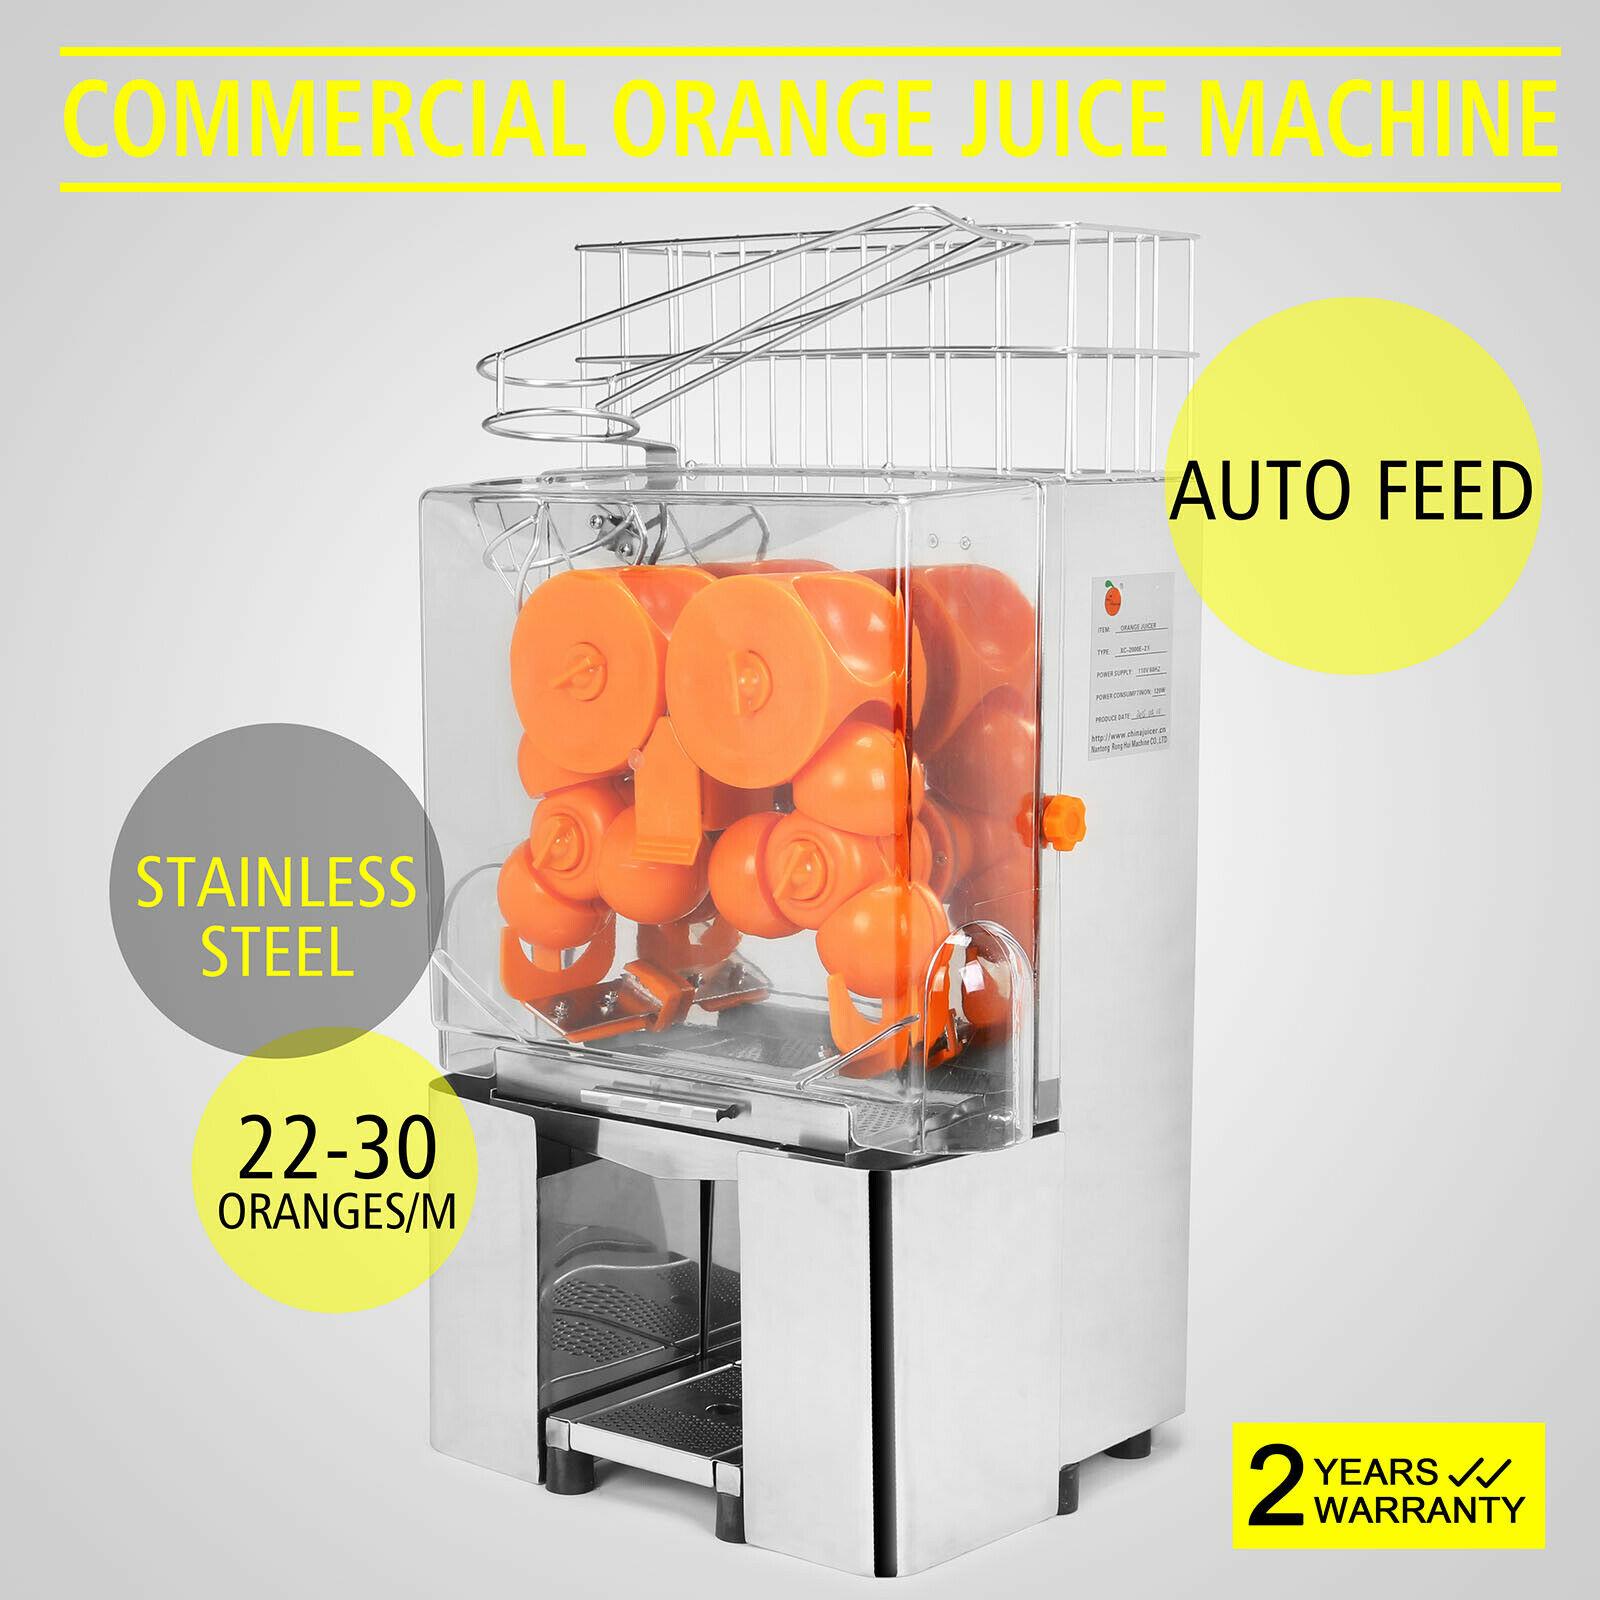 Electric Juicer Machine Commercial Automatic Orange Squeezer Grapefruit Juice Extractor Professional